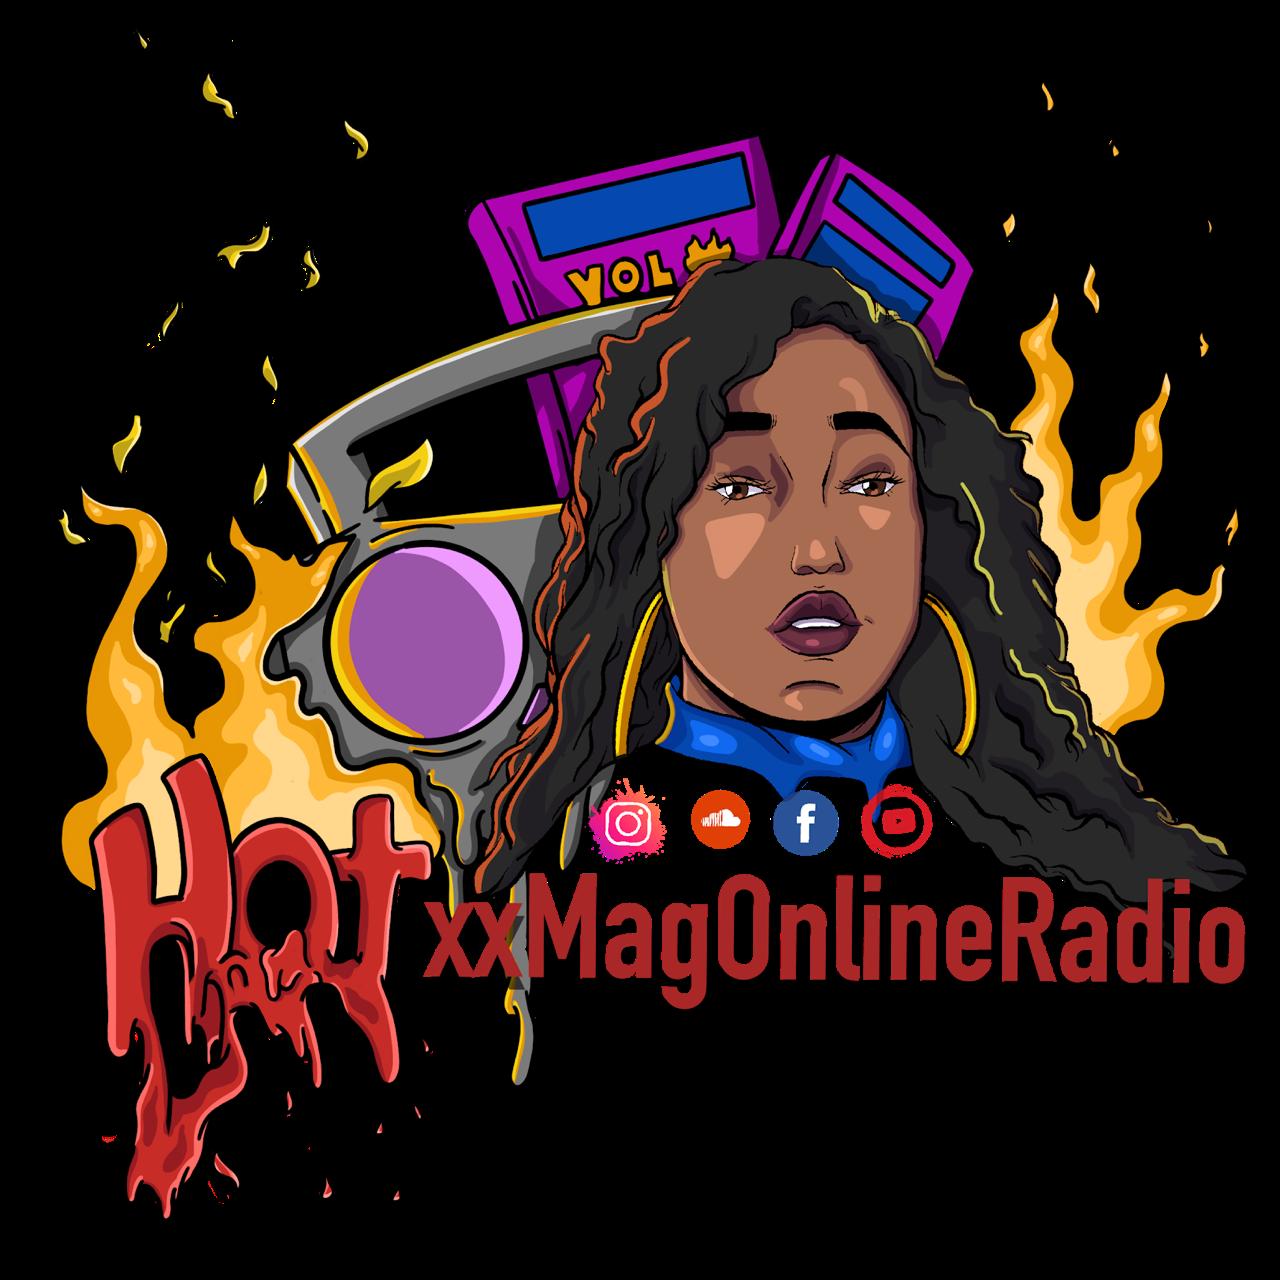 @HotxxMagOnlineRadio Profile Image | Linktree